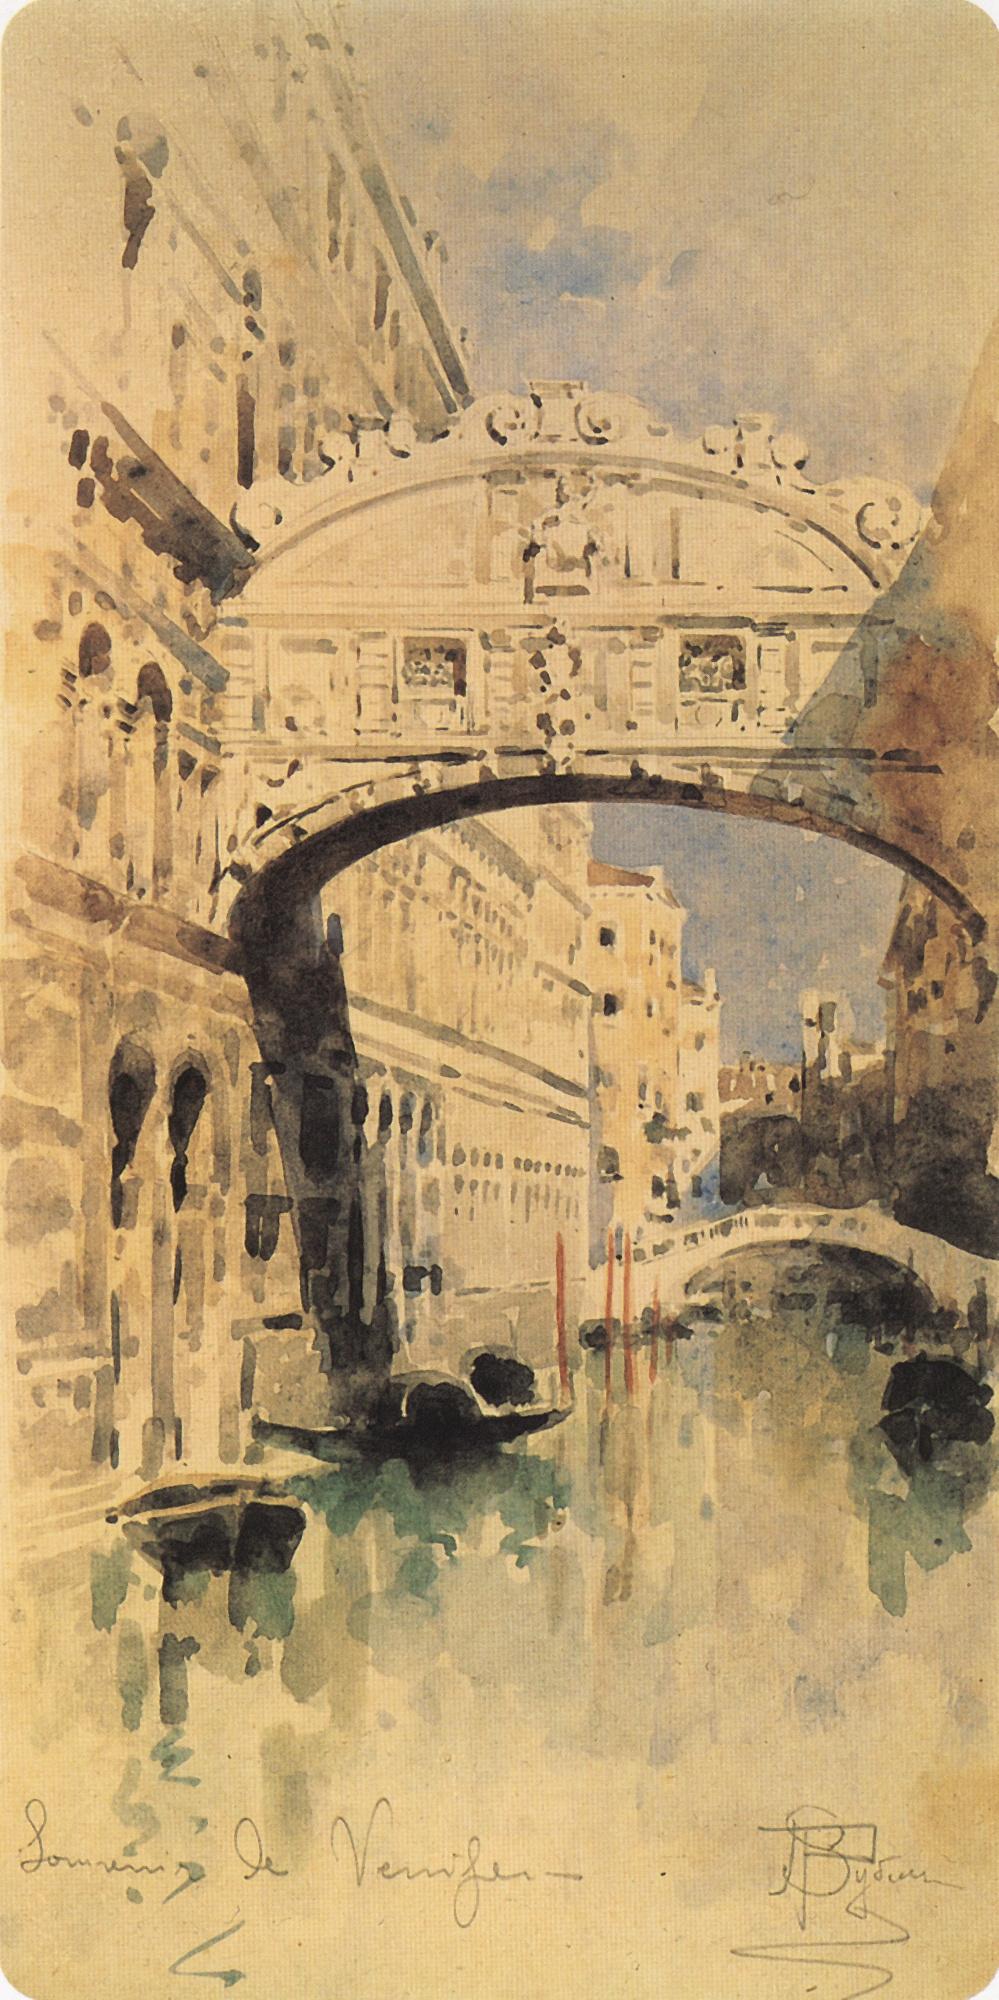 Mikhail Vrubel. The bridge of sighs. Venice